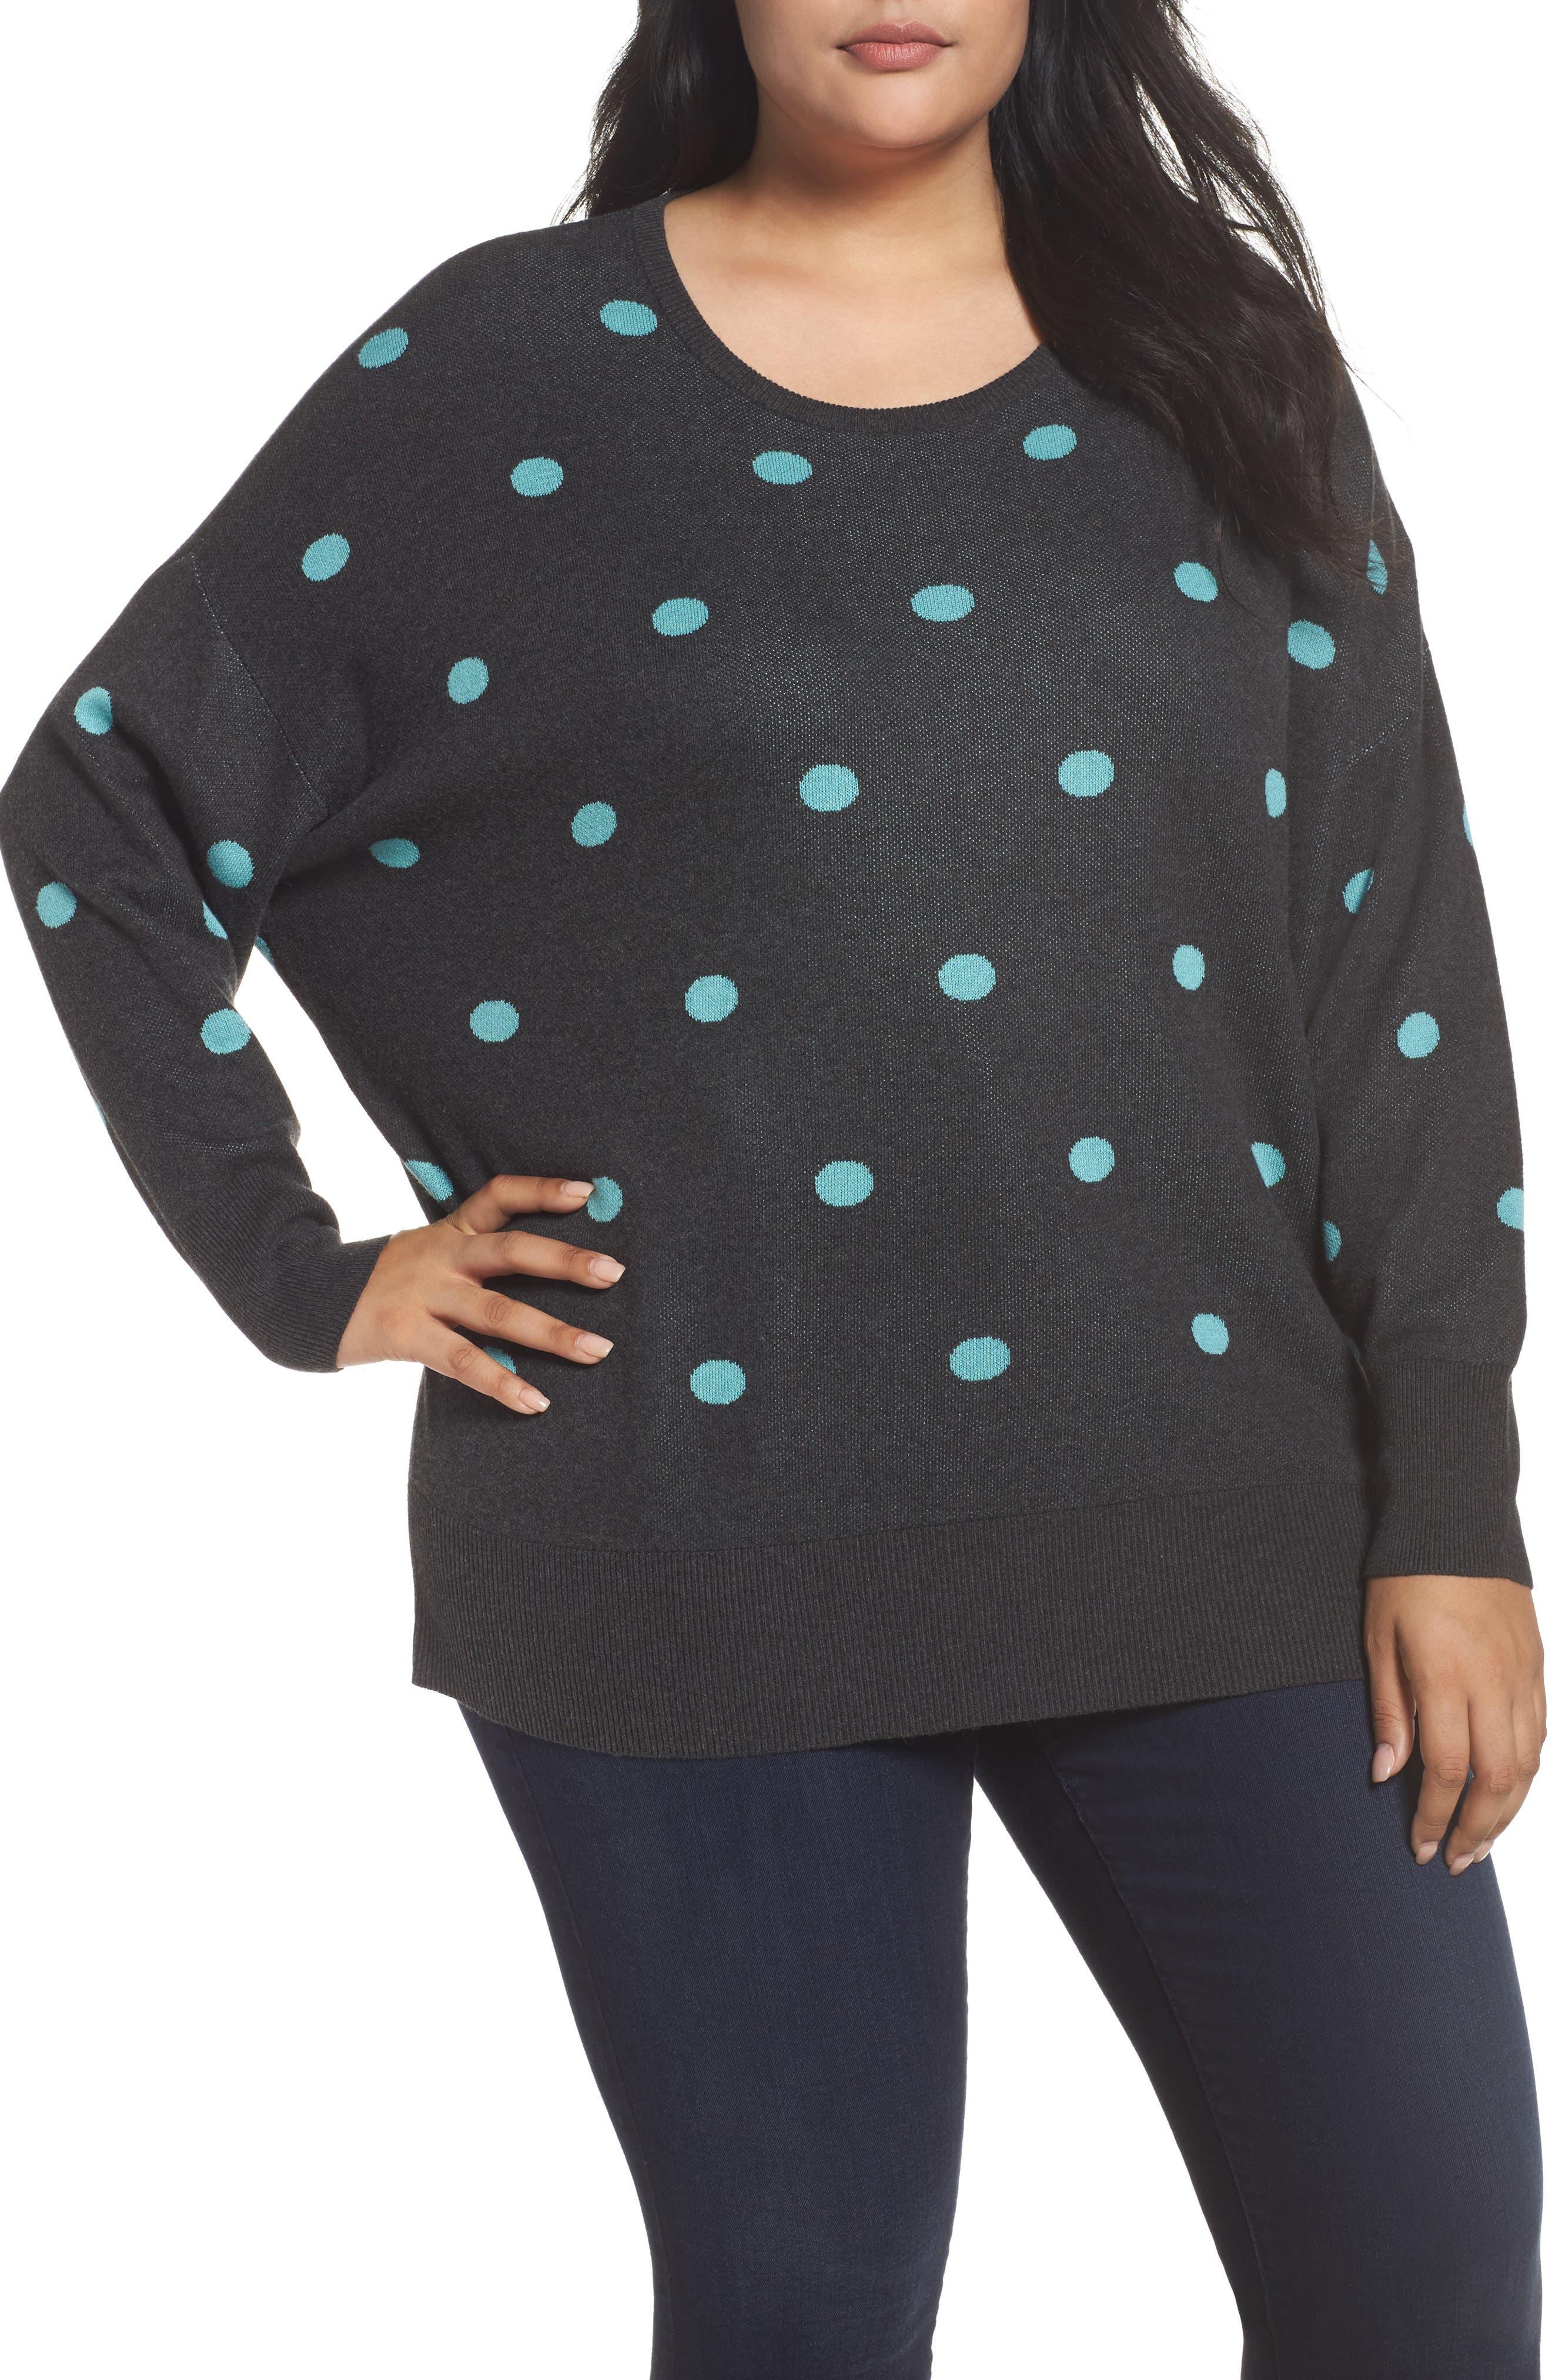 Dolman Sleeve Crewneck Sweater,                             Main thumbnail 1, color,                             Grey- Blue Dots Pattern